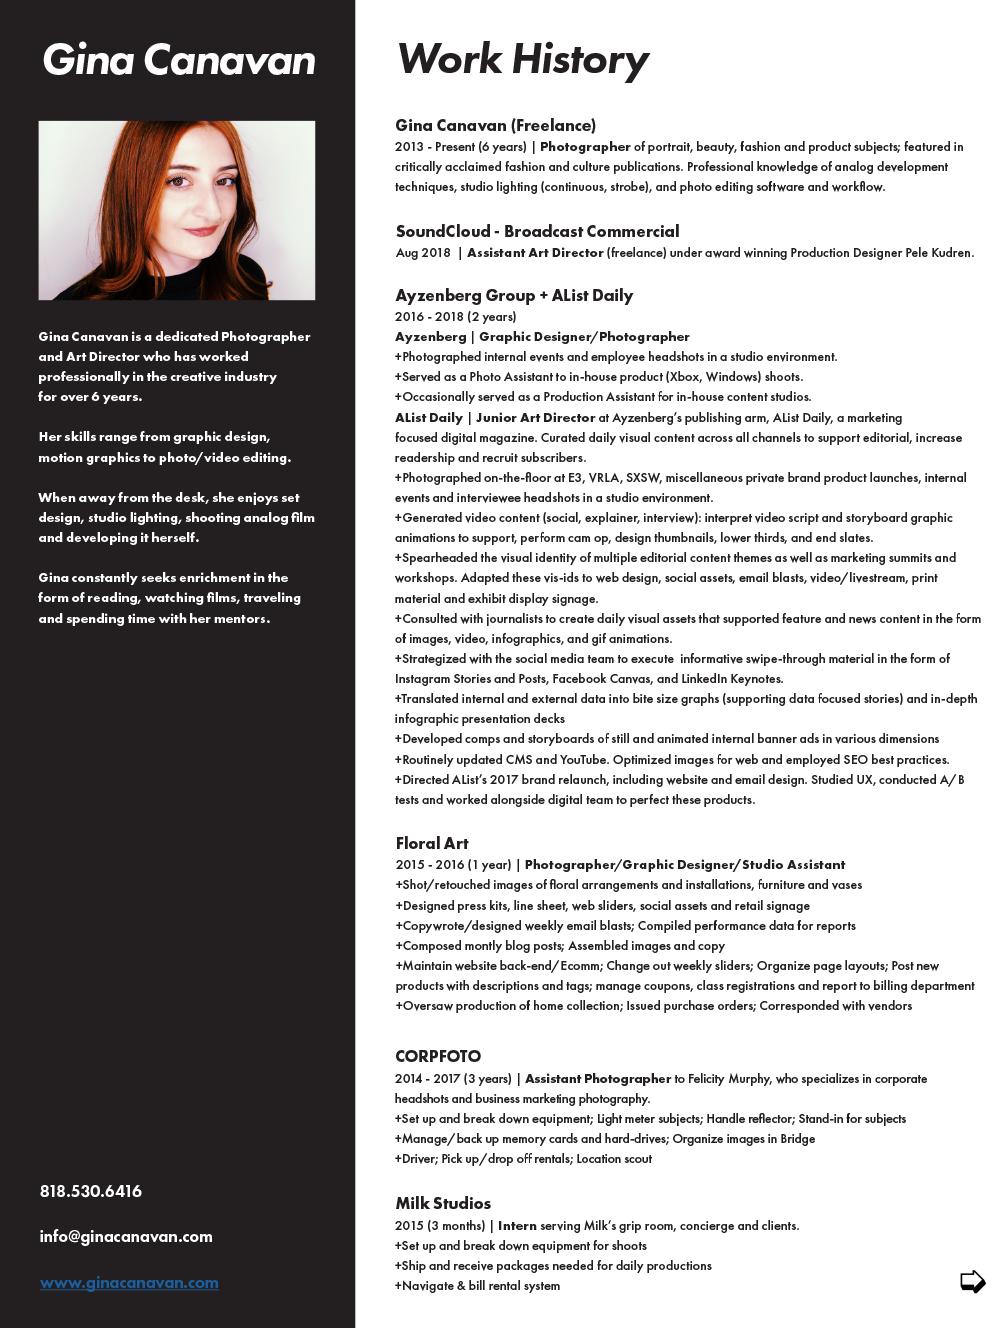 Gina_Canavan_Resume_v8.28-1.png